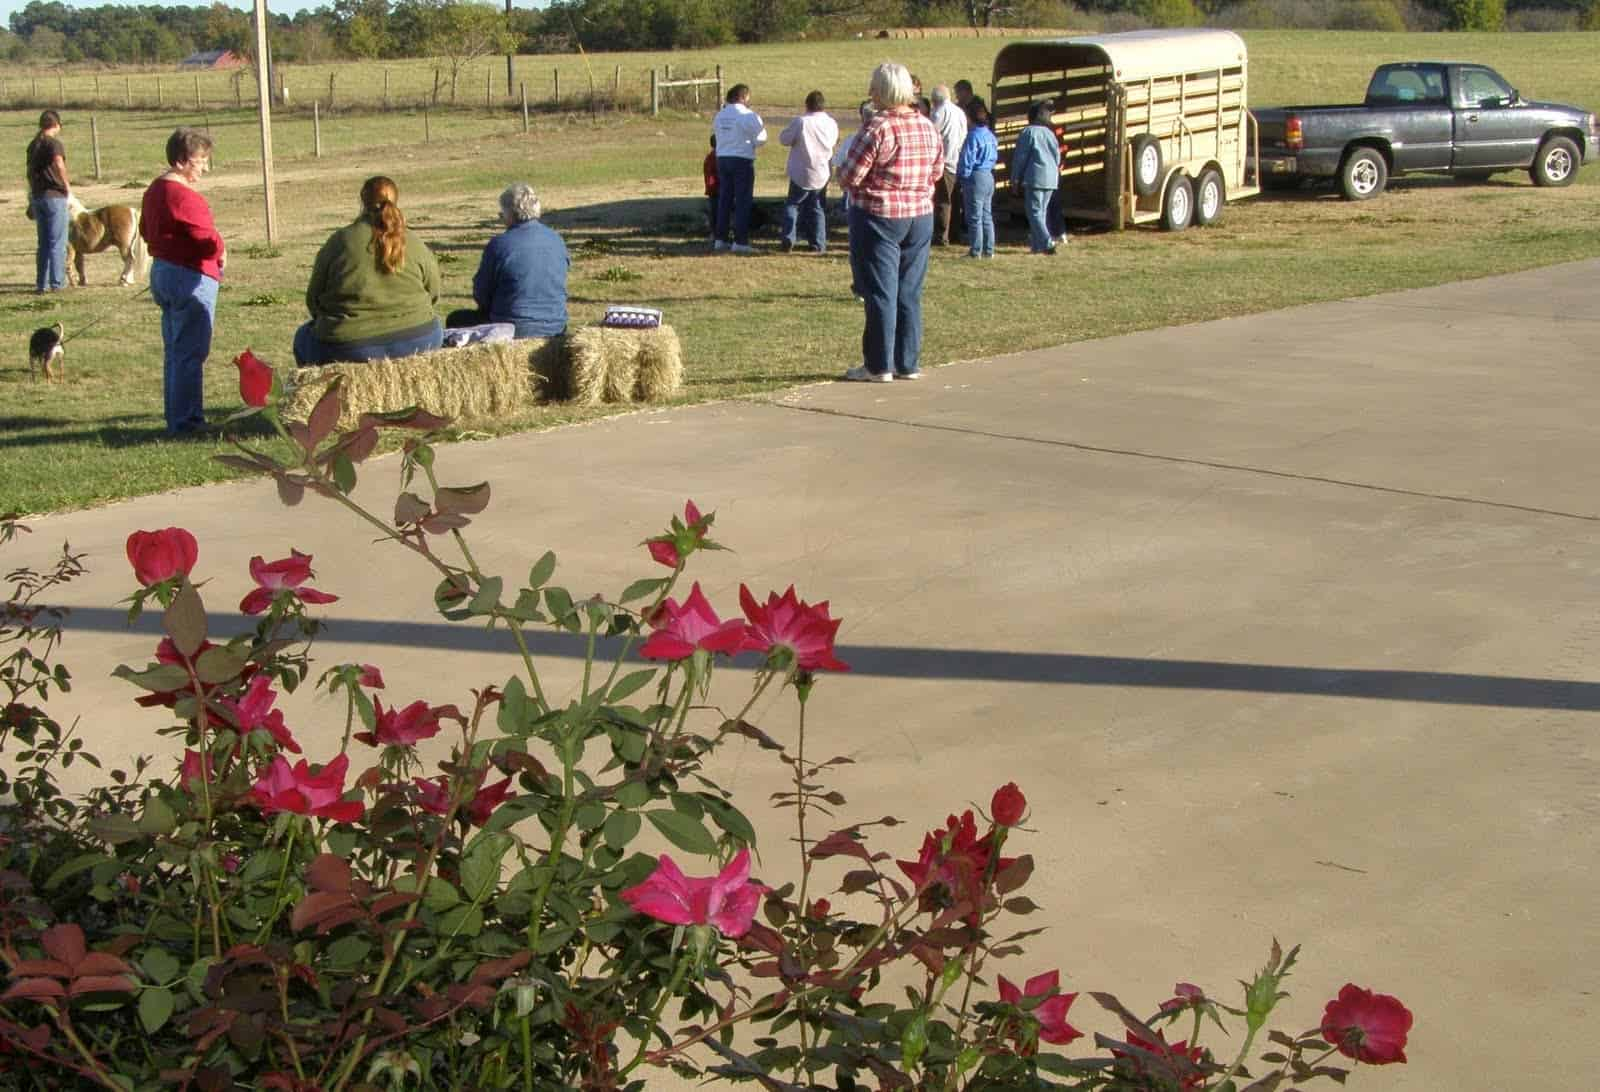 Rural Scenic with people TC RKLS 10 PB070130